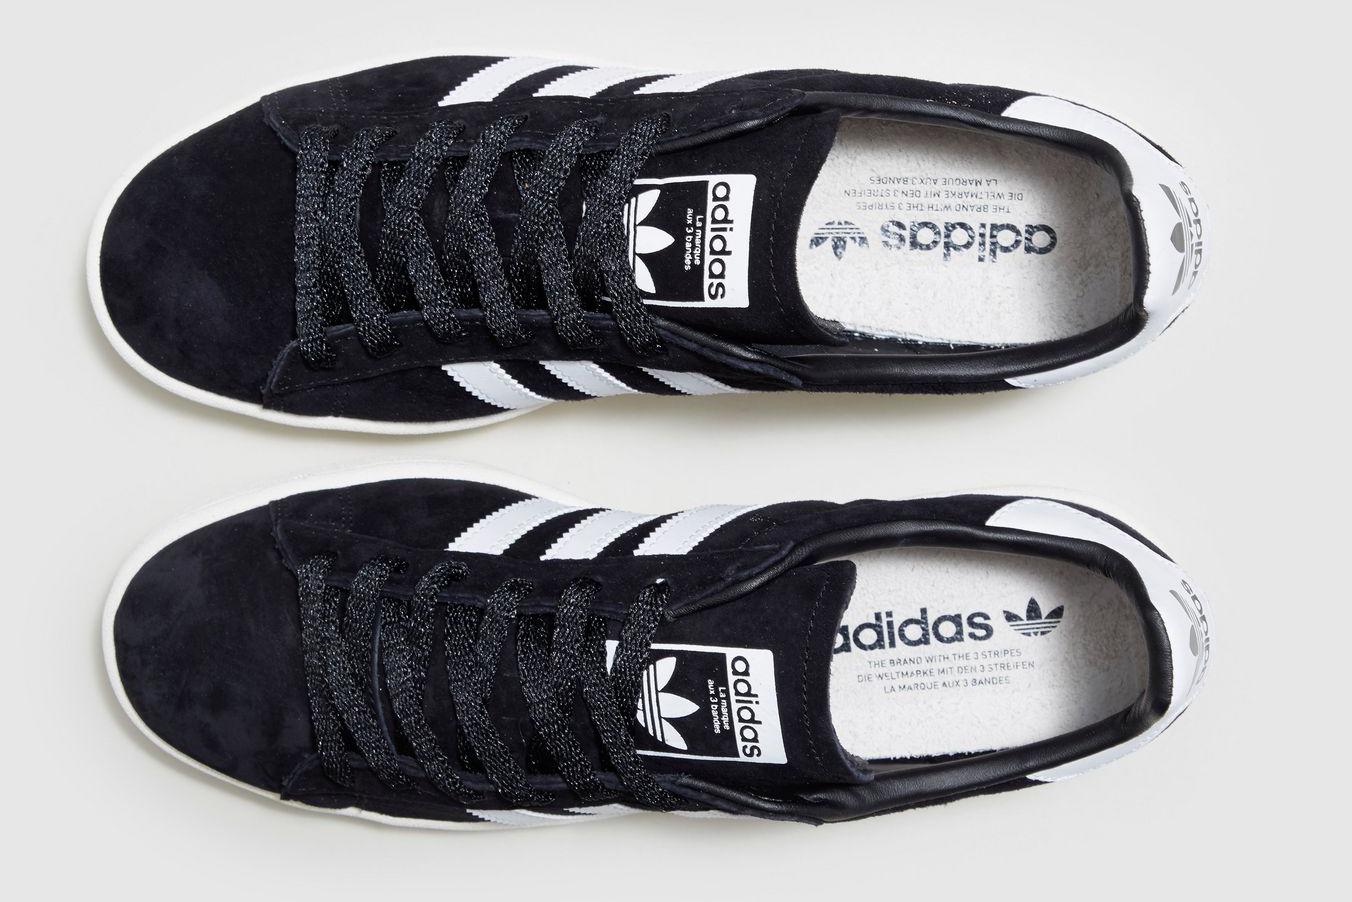 adidas superstar history